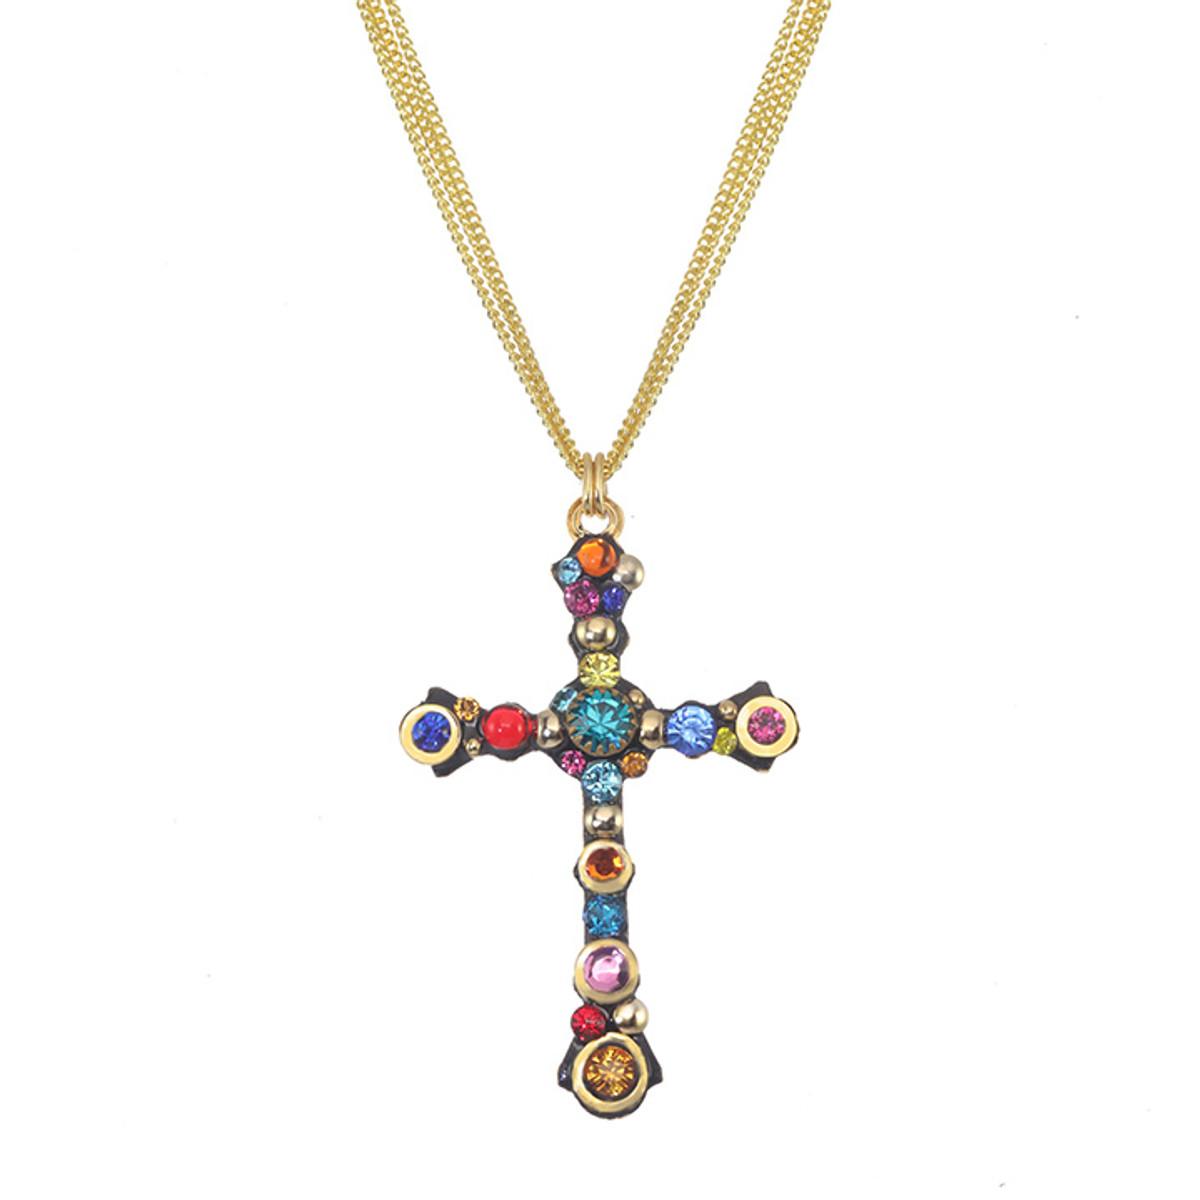 Michal Golan Michal Golan Cosmic Cross Necklace